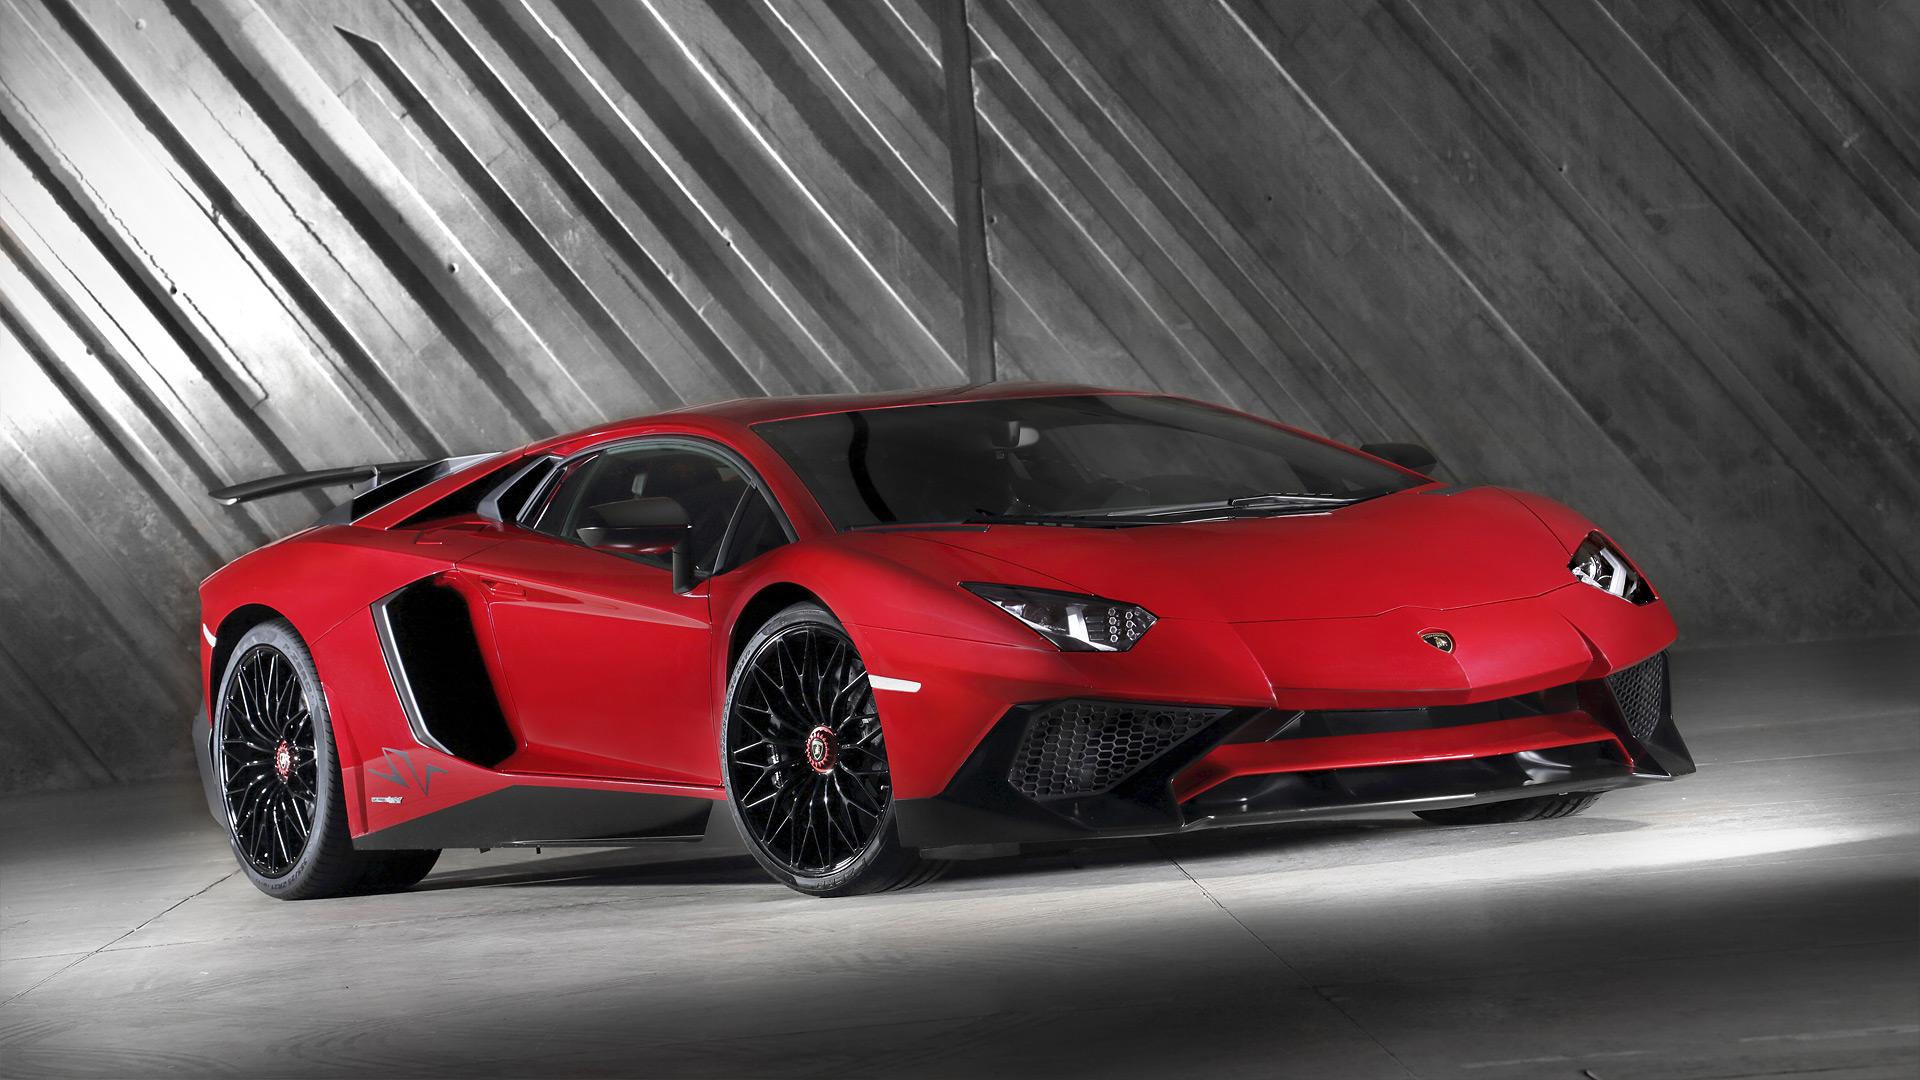 Lamborghini-Aventador-LP750-4-SV – 06